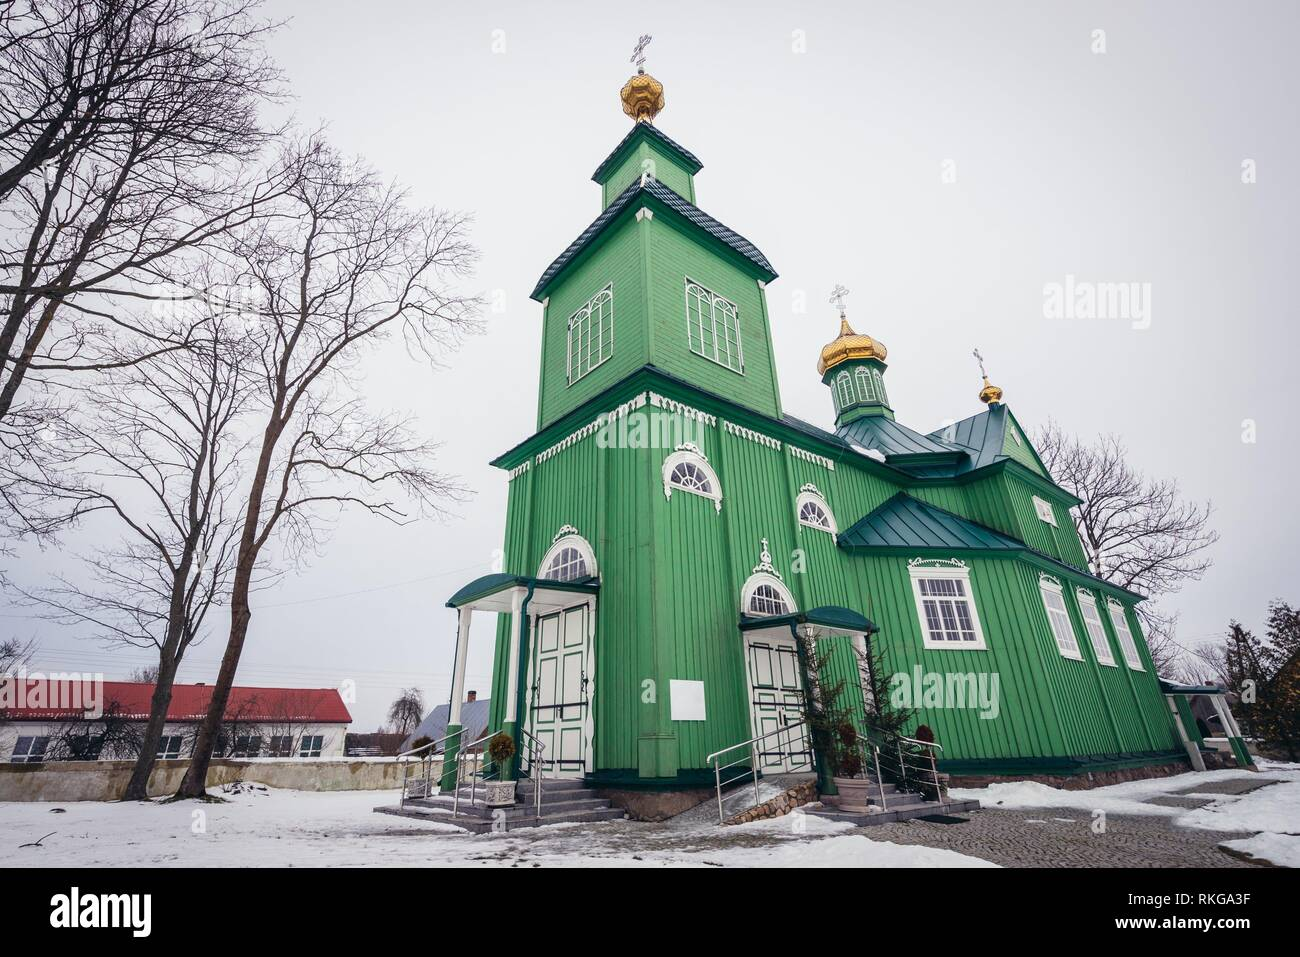 Orthodox Church of Saint Michael the Archangel in Trzescianka village, Hajnowka County in Podlaskie Voivodeship of northeastern Poland. - Stock Image